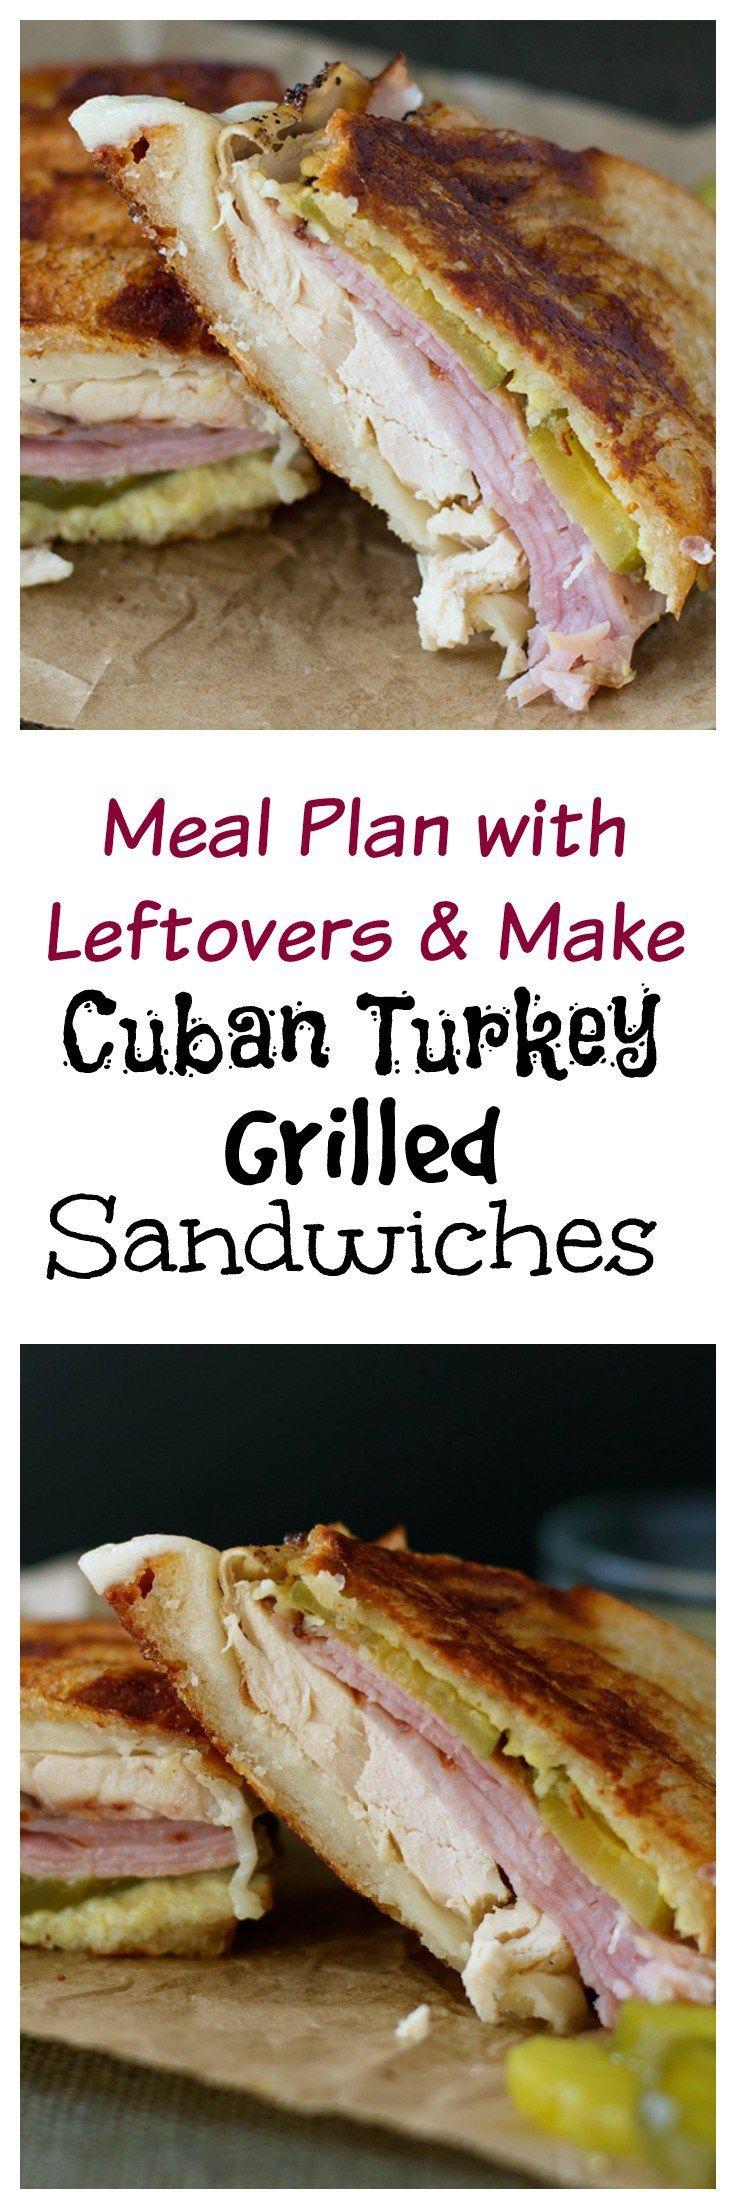 Turkey Ham Leftover Recipes Turkey Cuban Sandwiches Recipe Turkey Ham Hams And Grilled